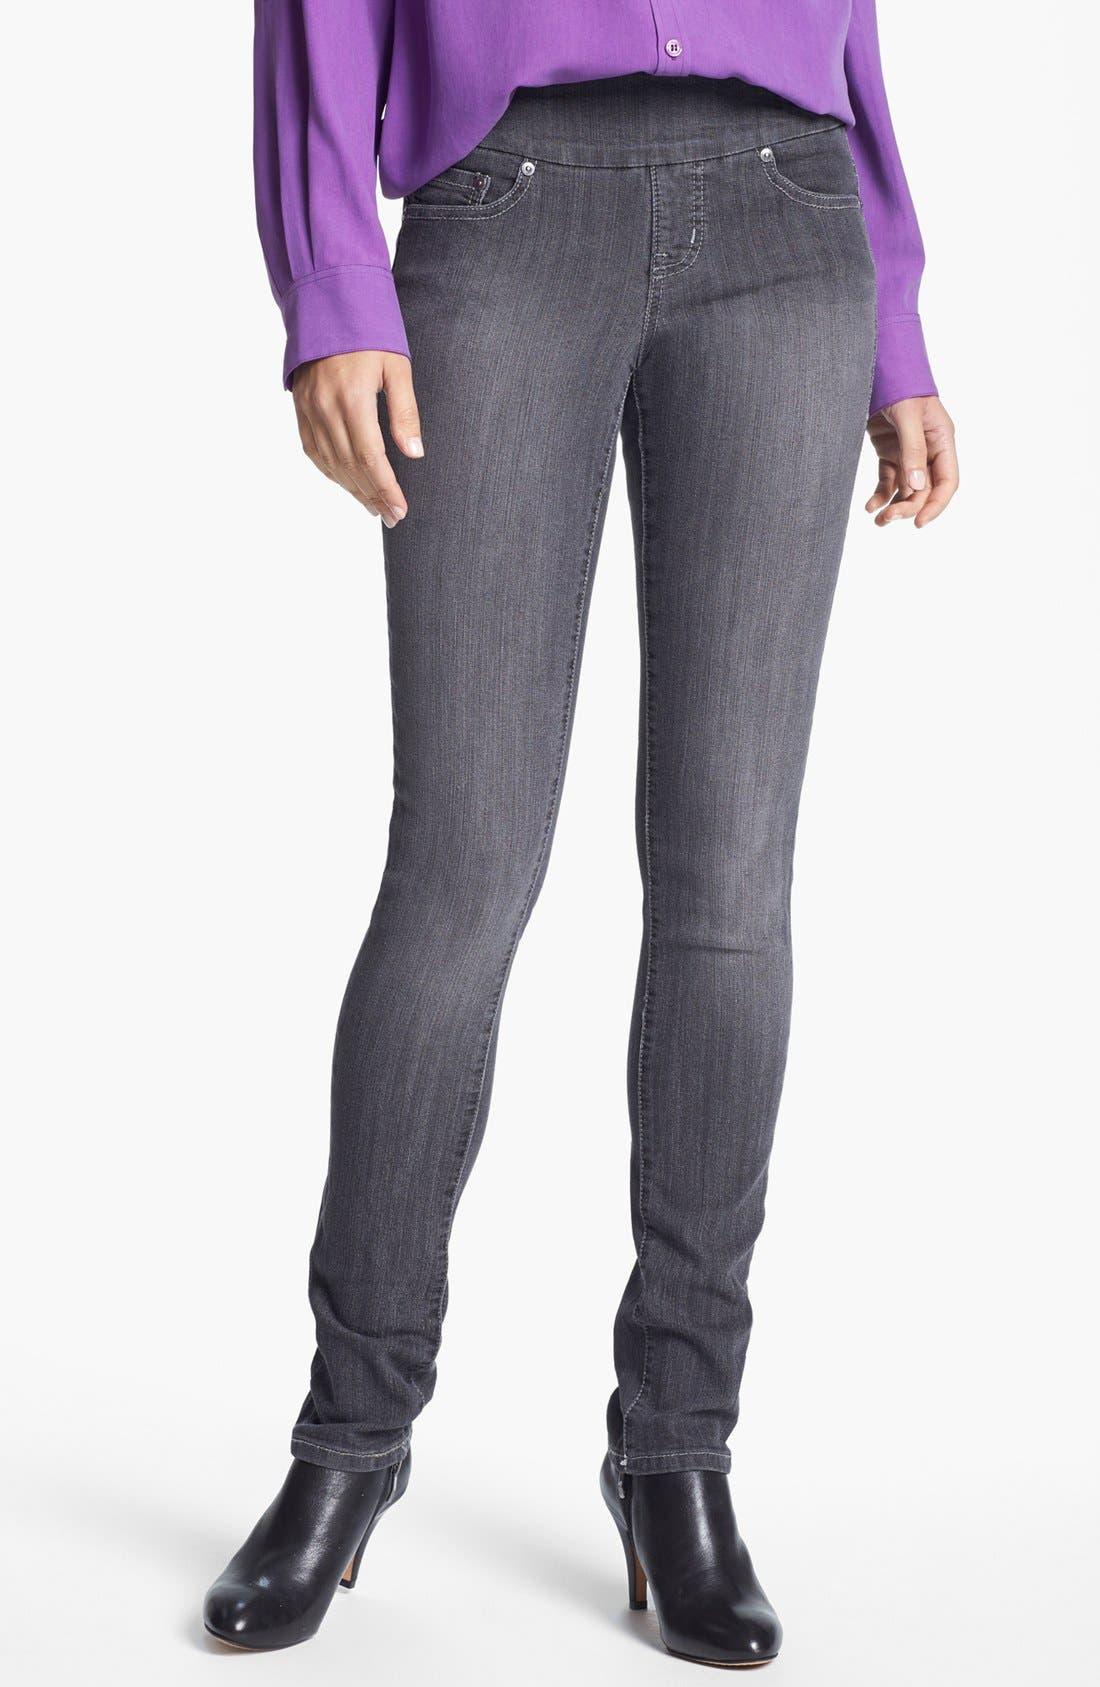 Alternate Image 1 Selected - Jag Jeans 'Malia' Slim Leg Stretch Jeans (Grey)